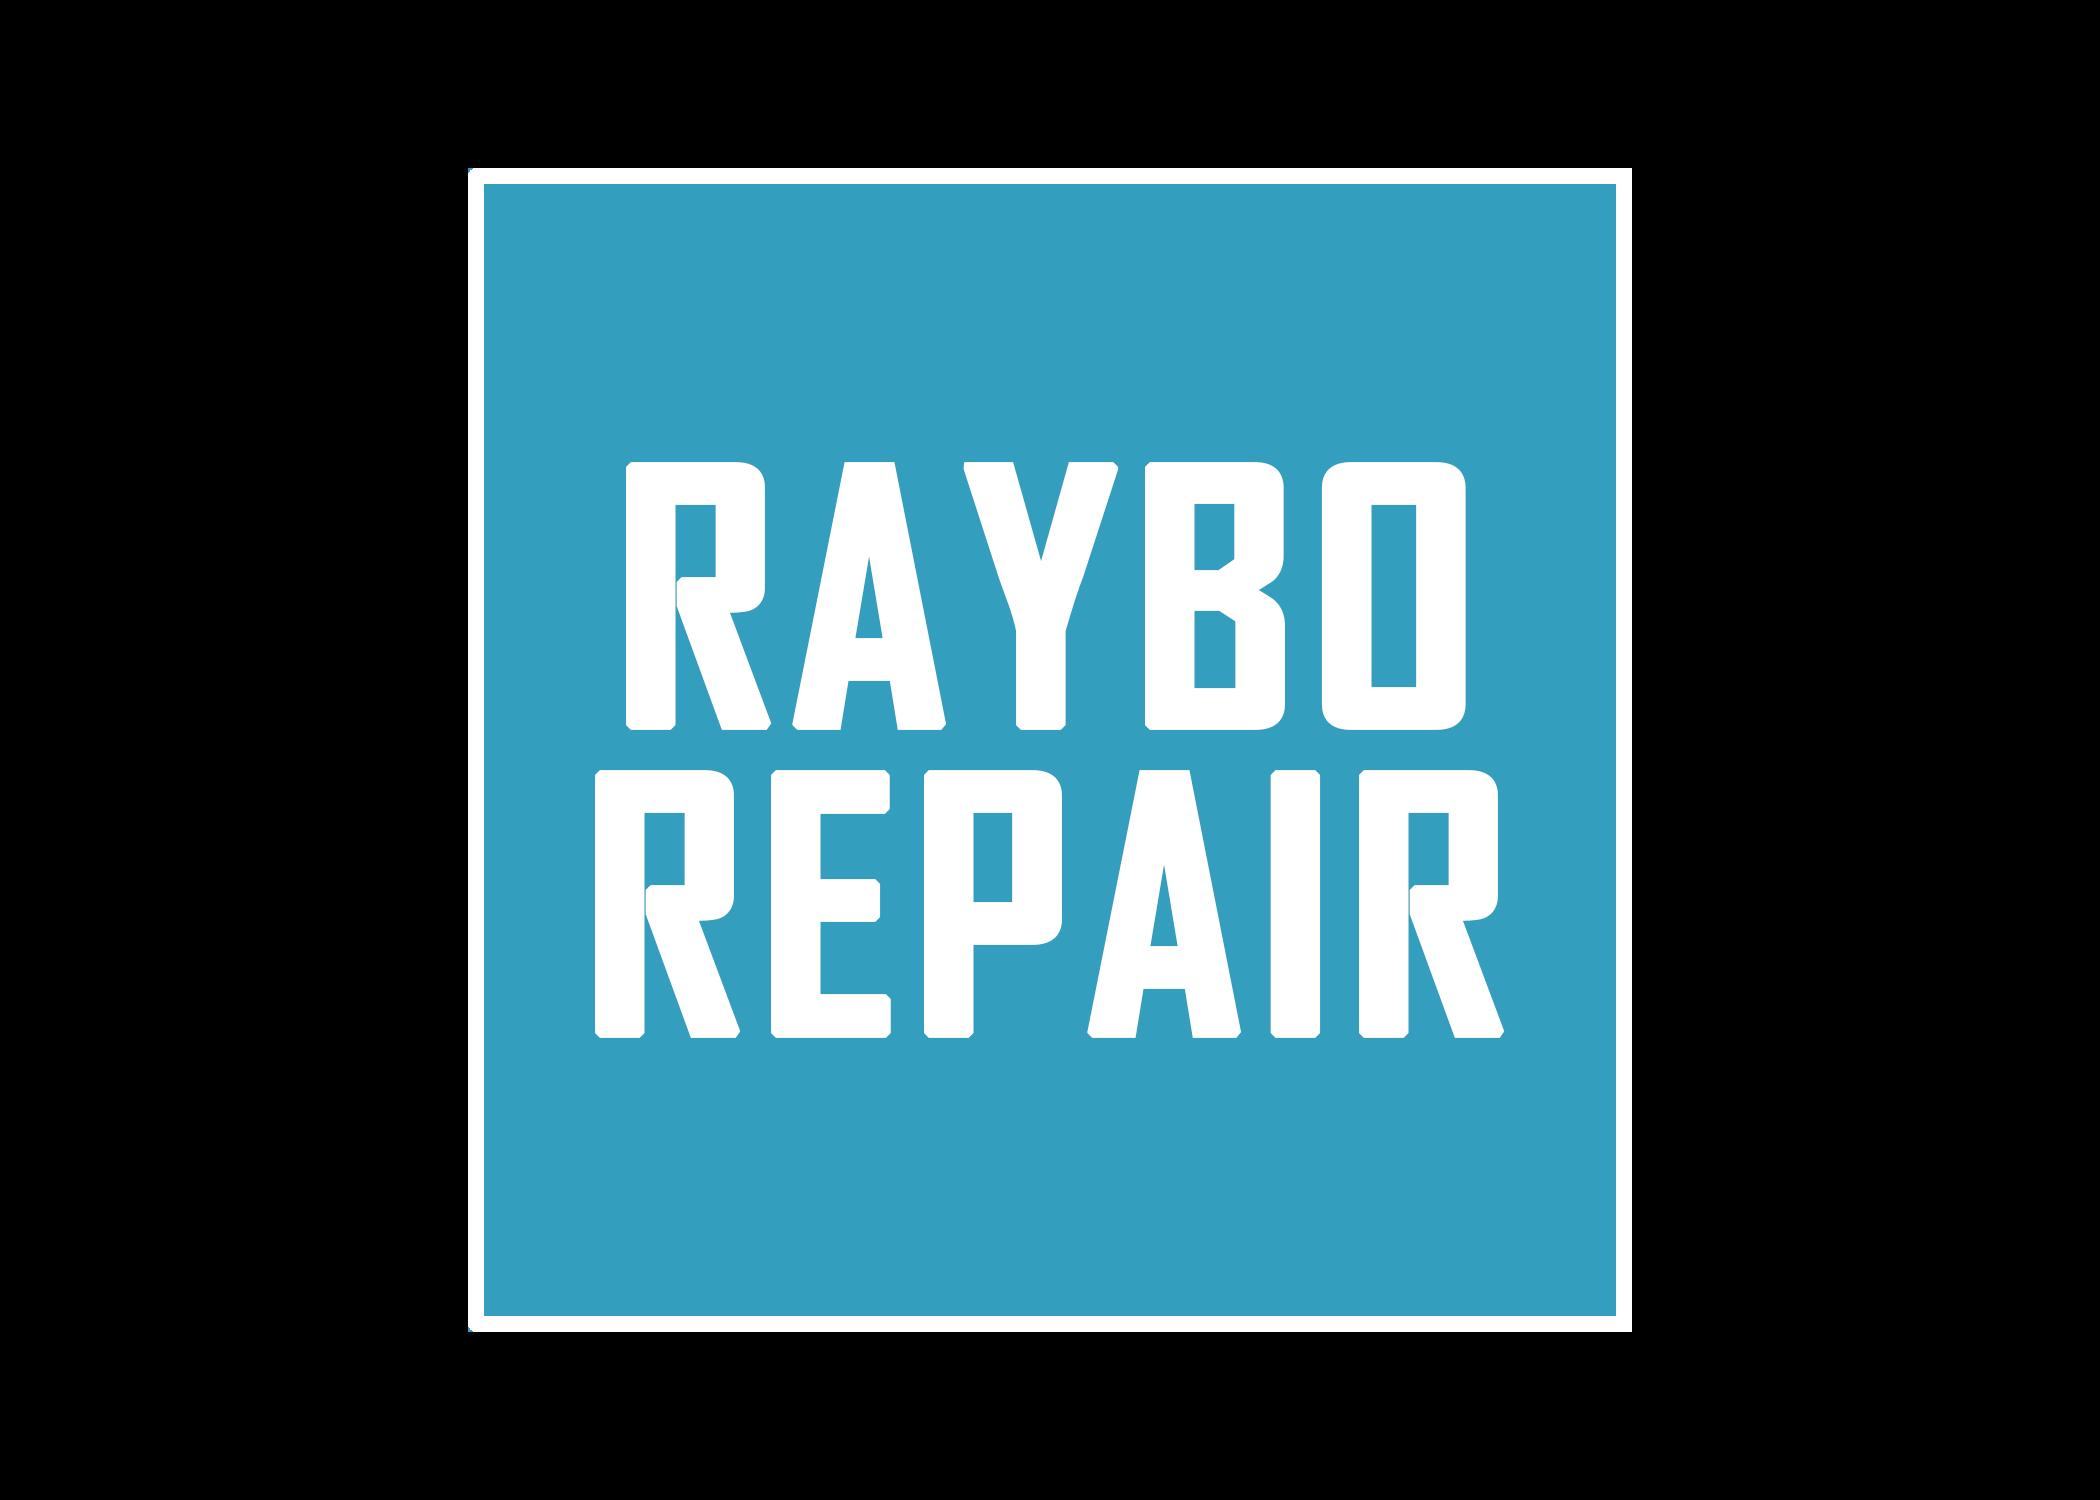 Raybo Repair logo